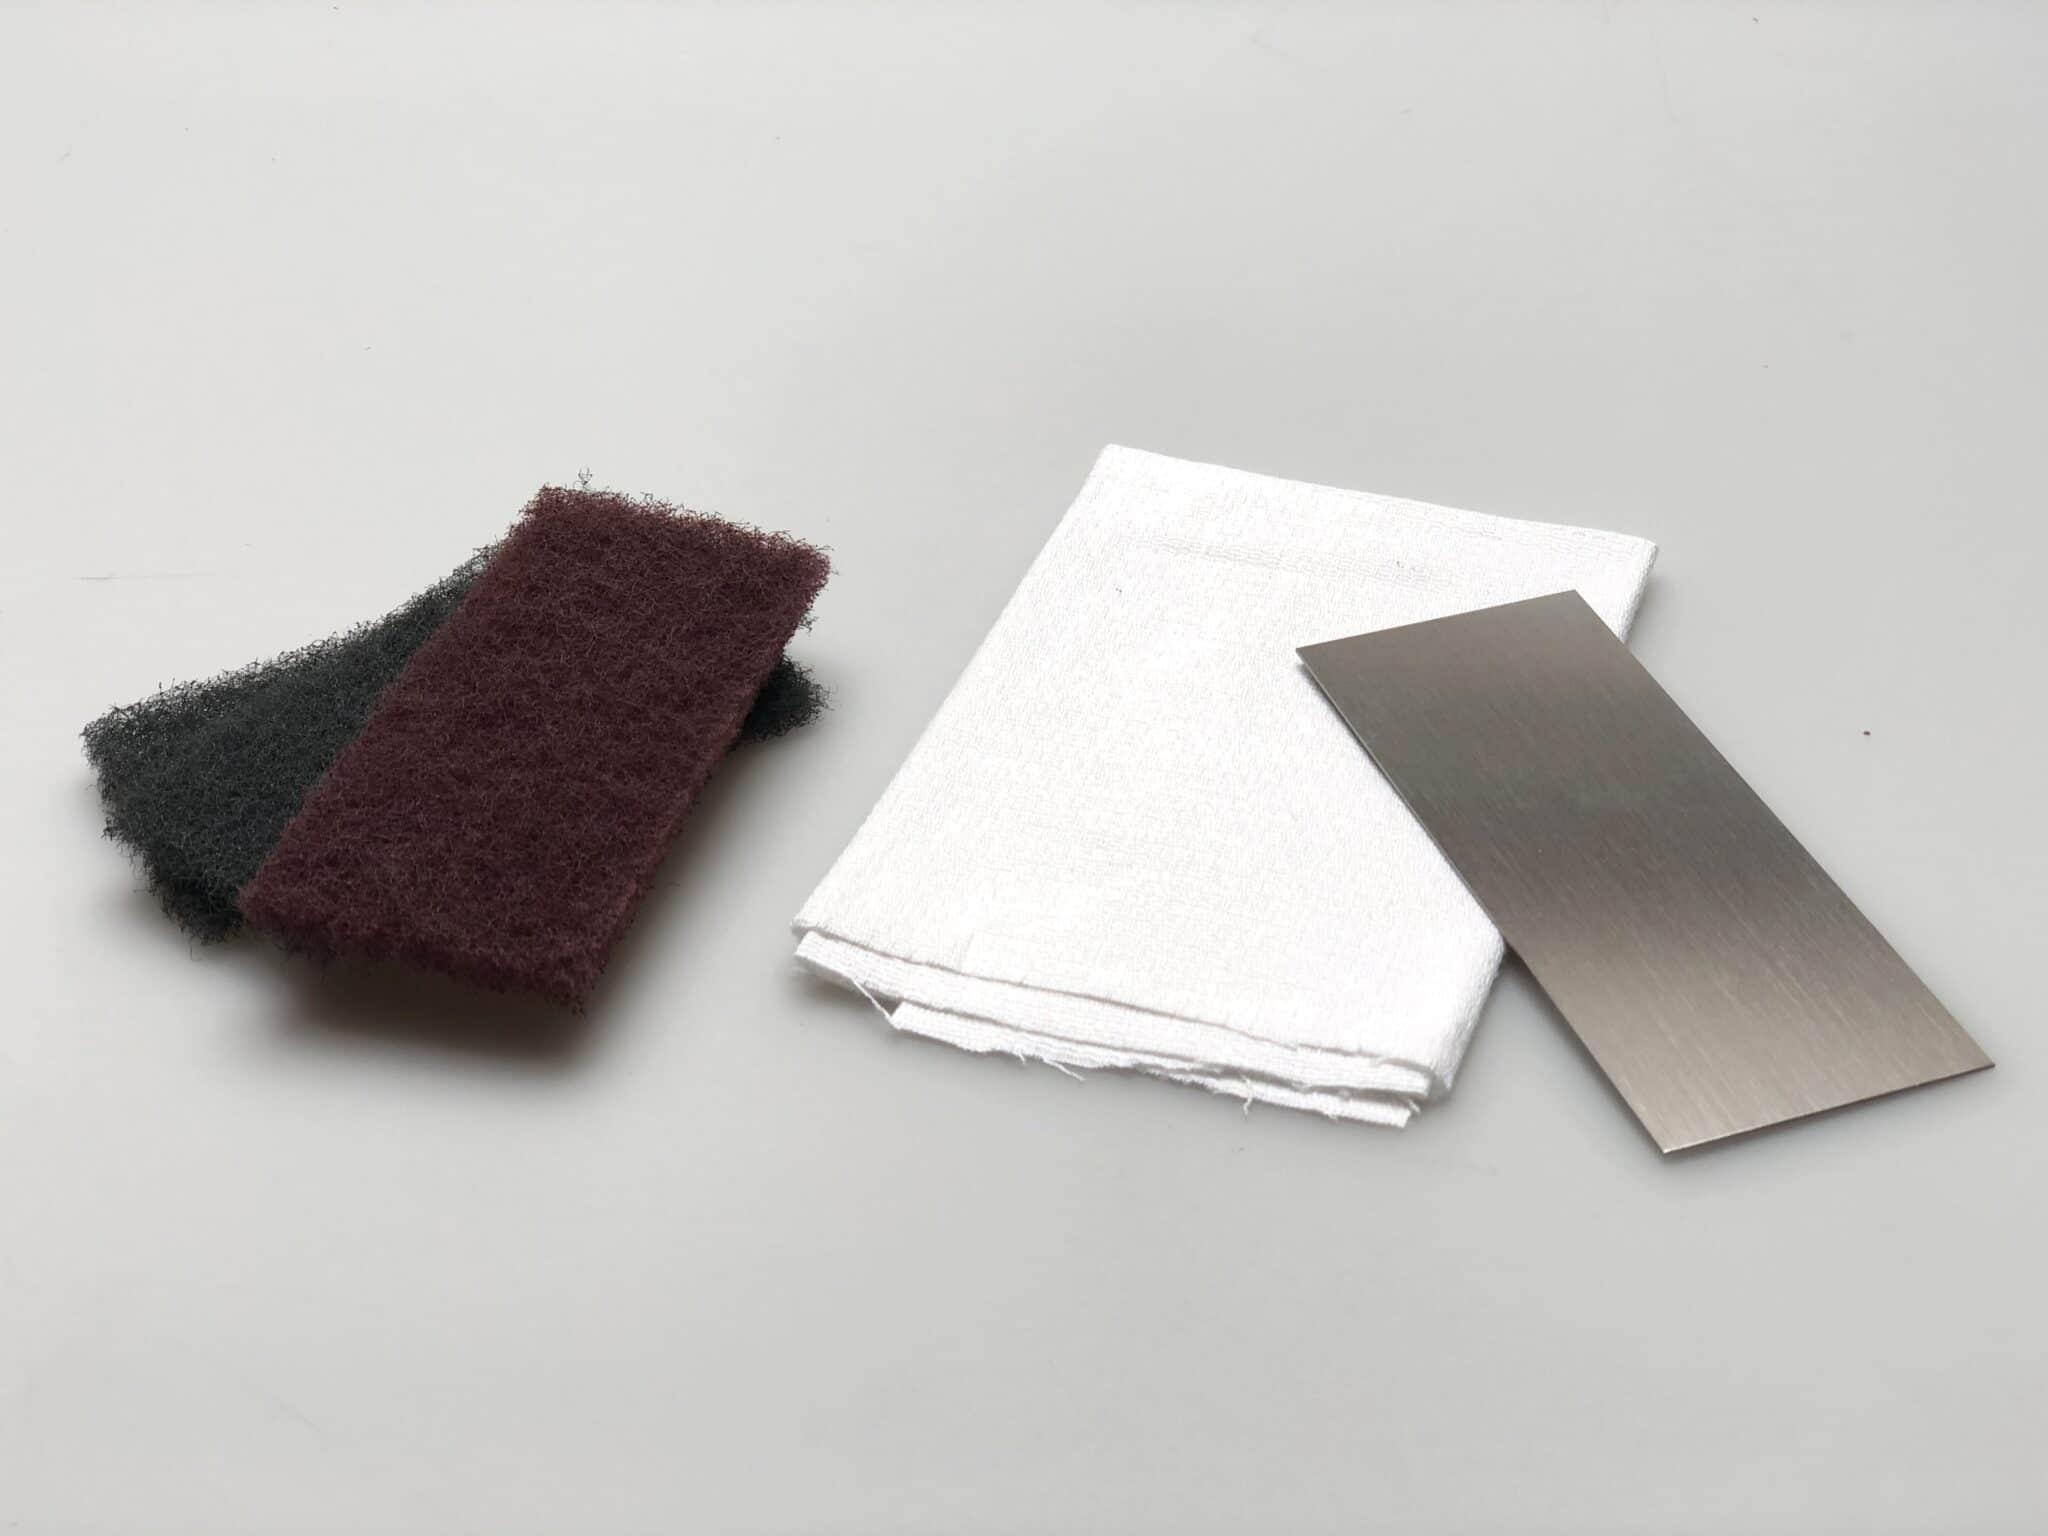 tissu de polissage, lame lisse, tissu de nettoyage